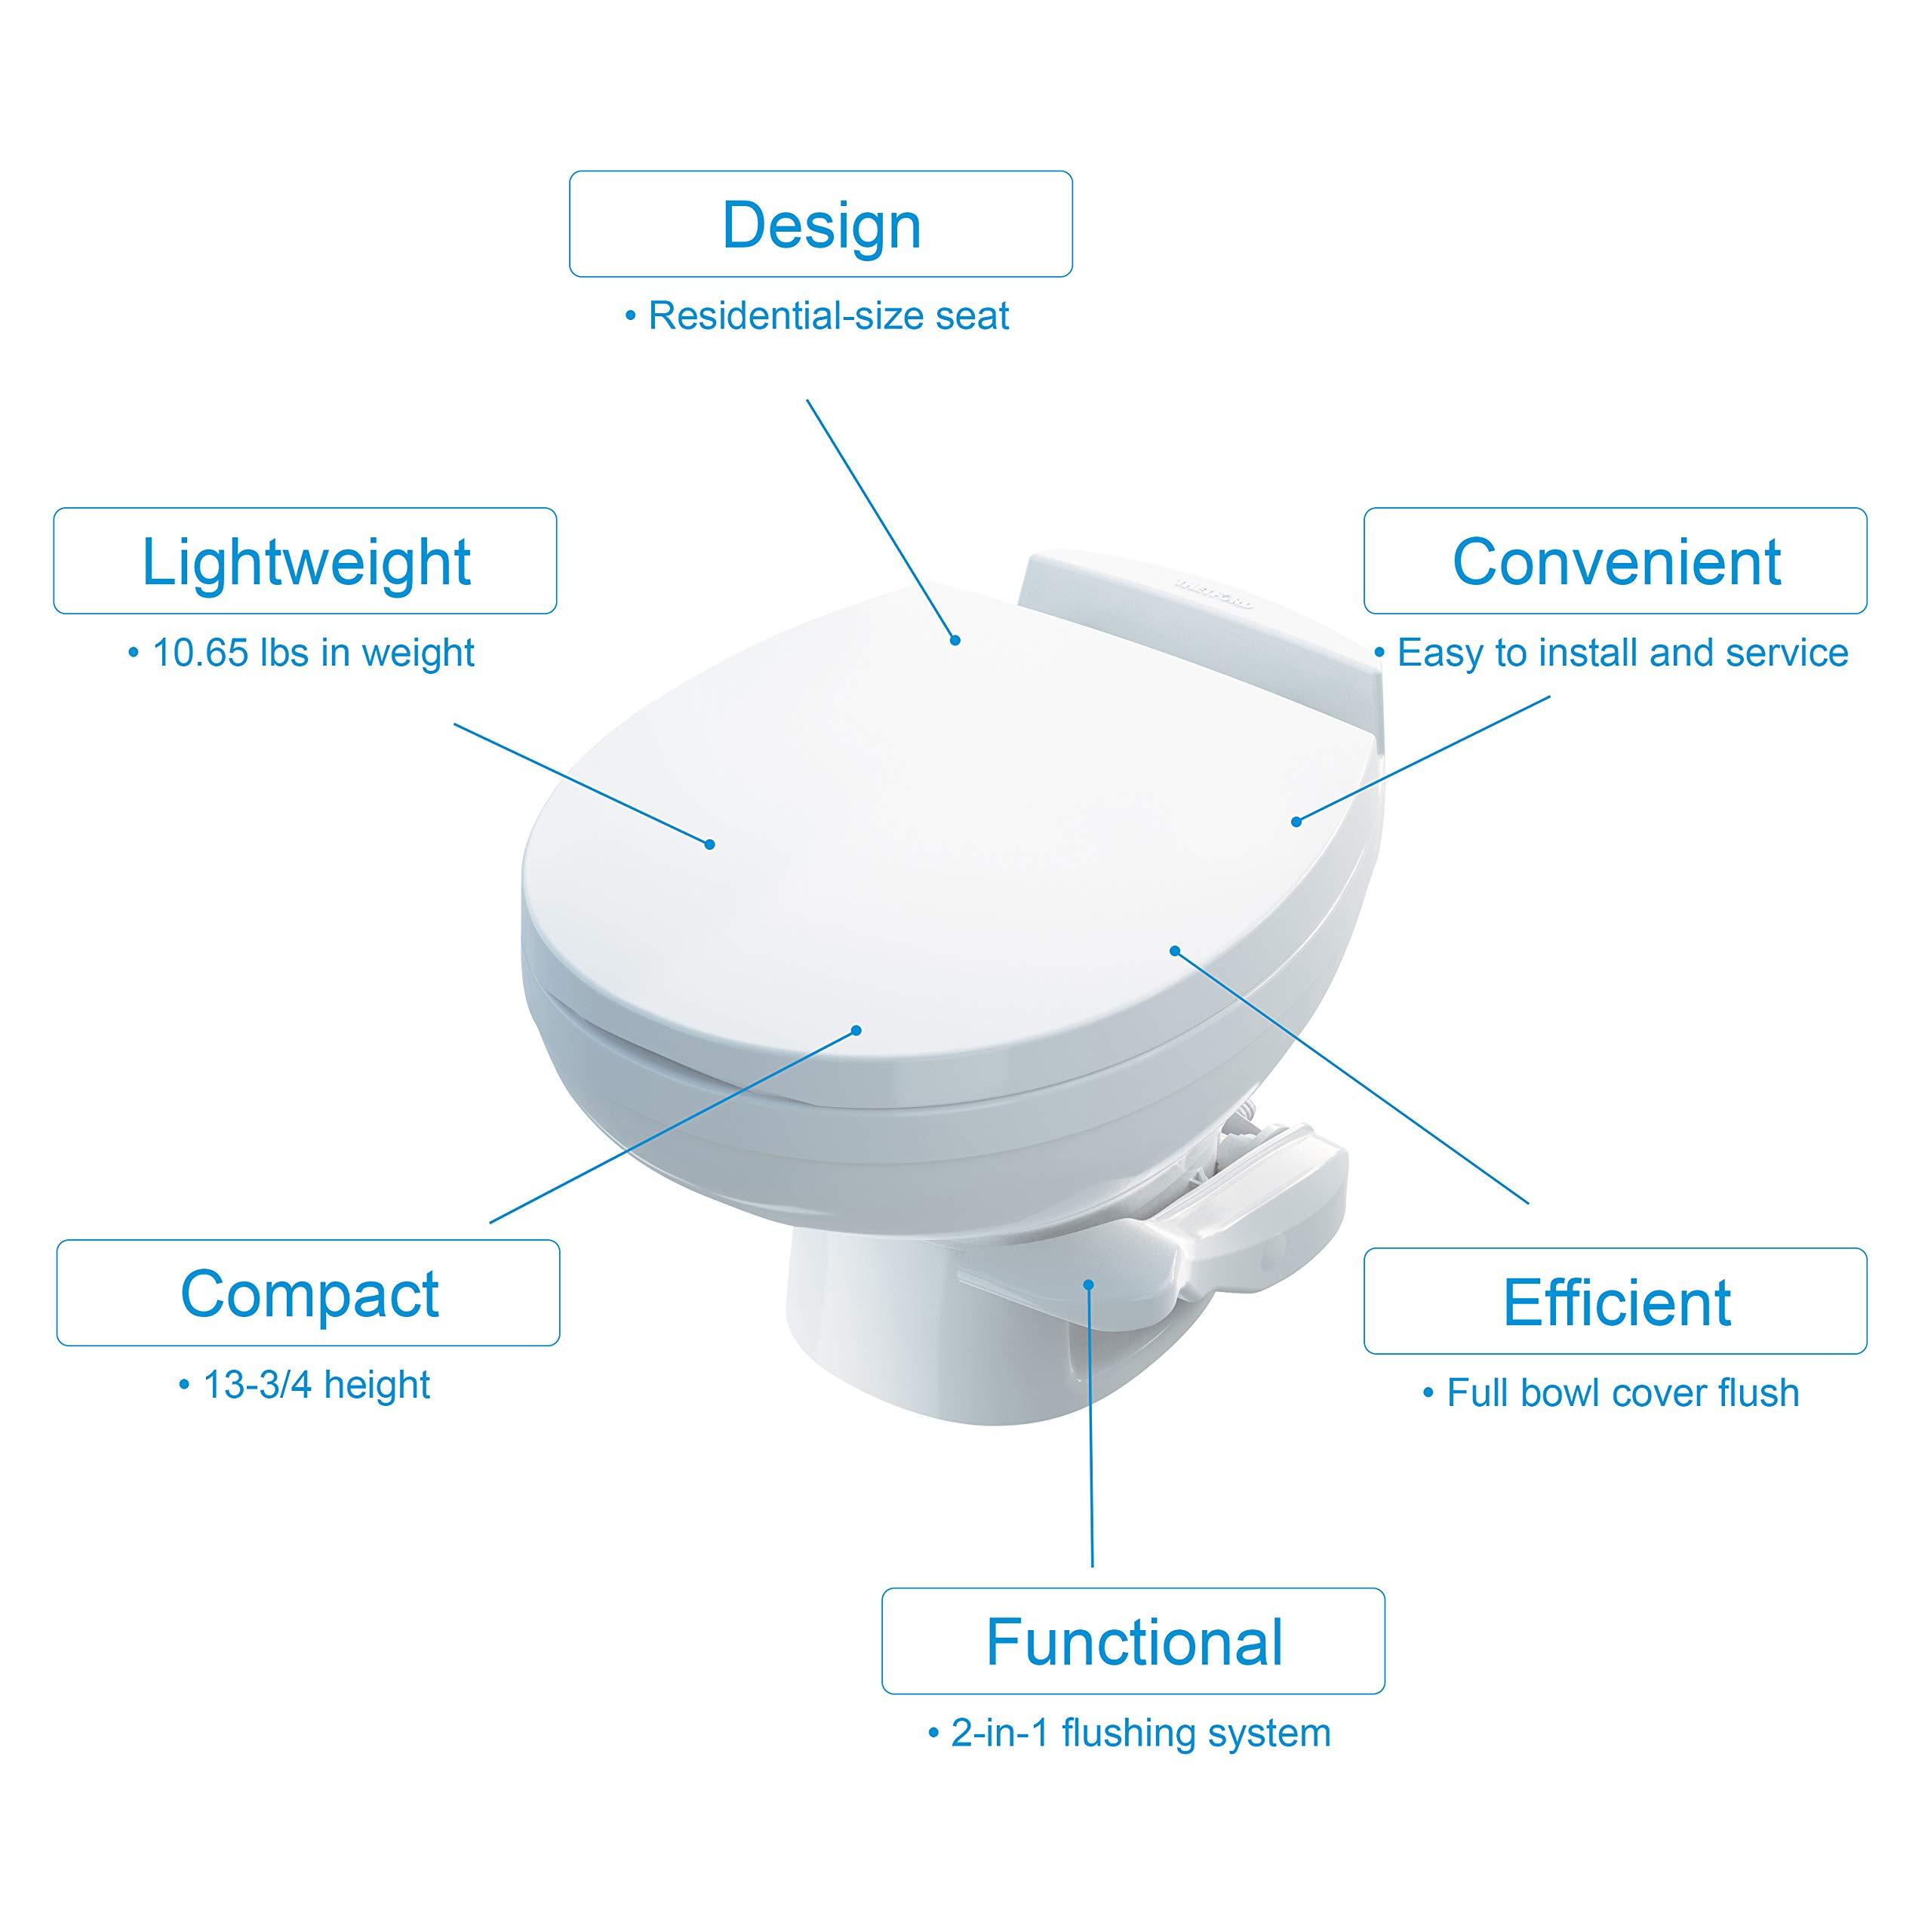 Thetford 1223.1310 Aqua Magic Residence RV Toilet-Low Profile-White Color-Hand Sprayer 42174 by Thetford